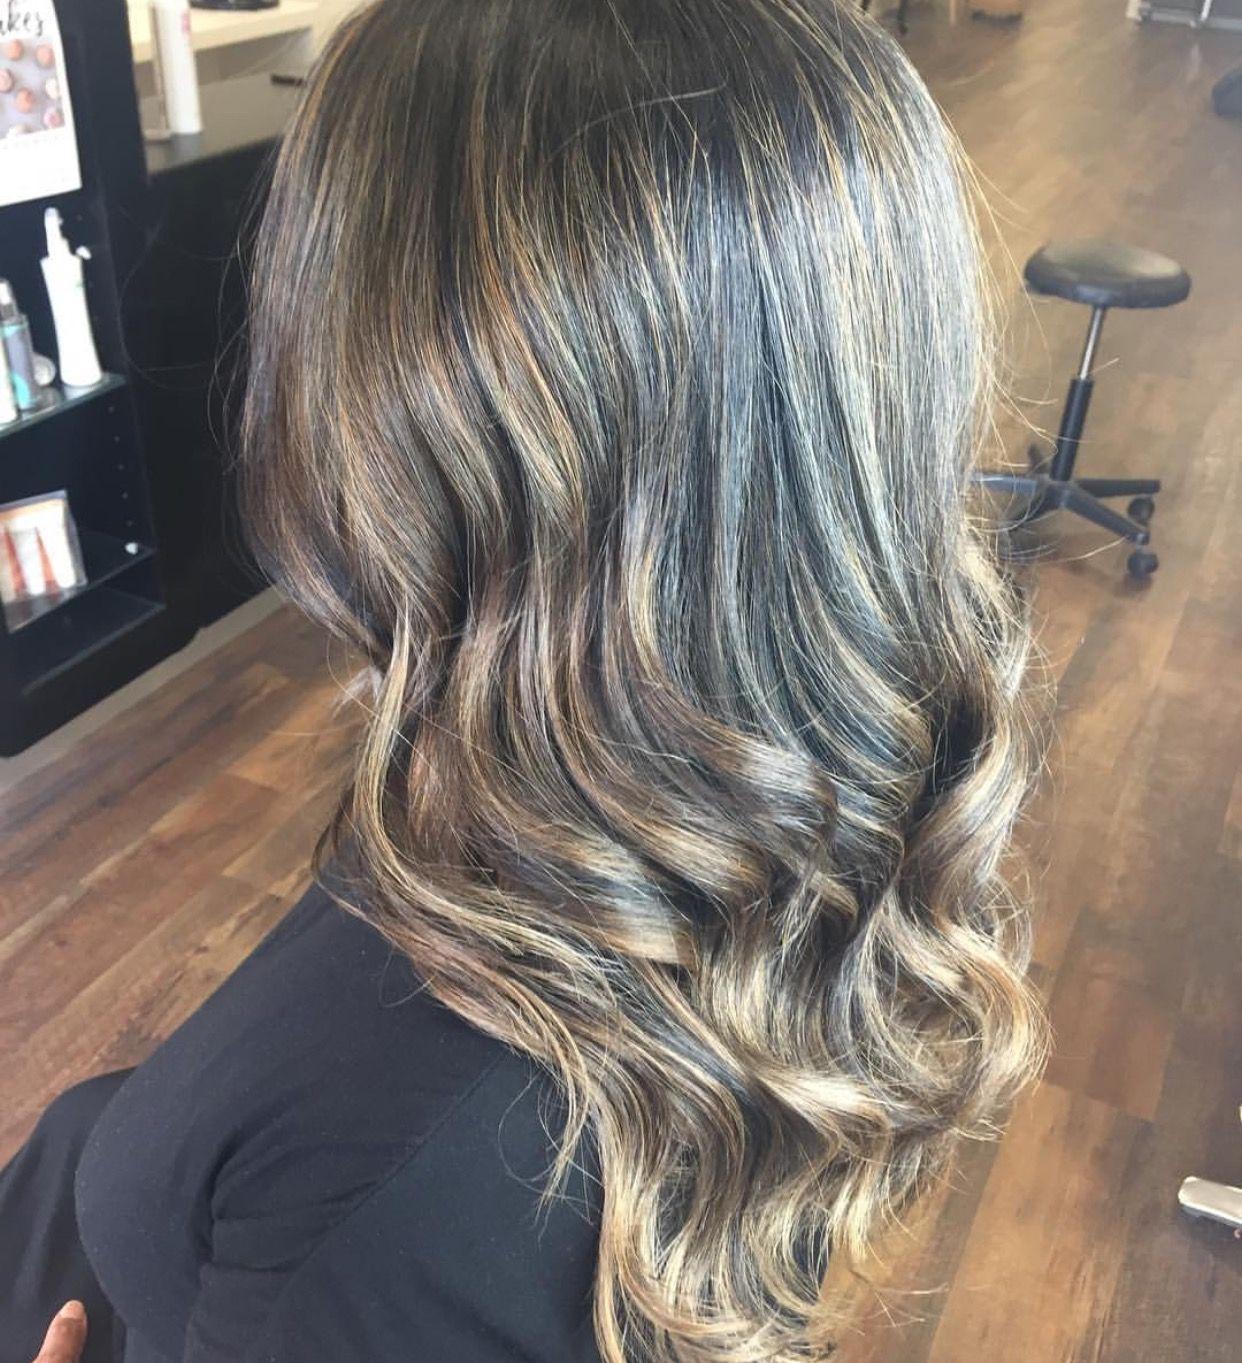 Black Indian Hair With Colour Melt Balayage Ash Brown And Caramel Tint Hair Color Indian Hairstyles Balayage